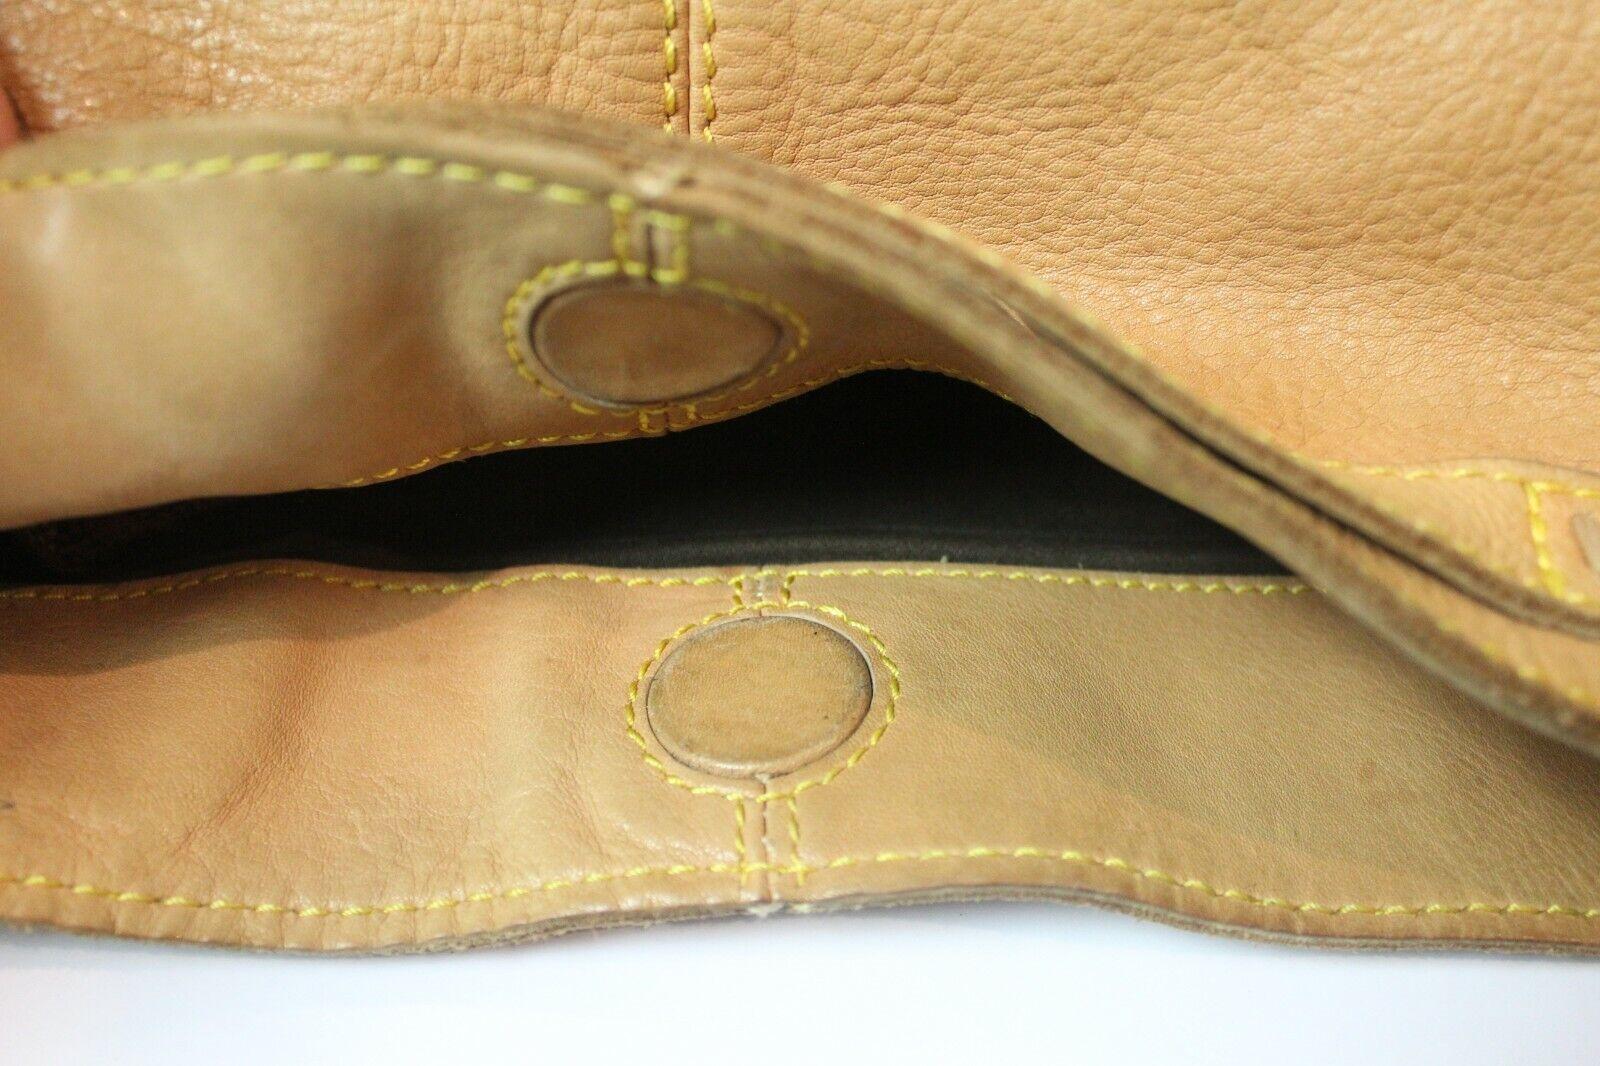 49 Square Miles Tan Leather Bag Hobo Large Bag - image 7